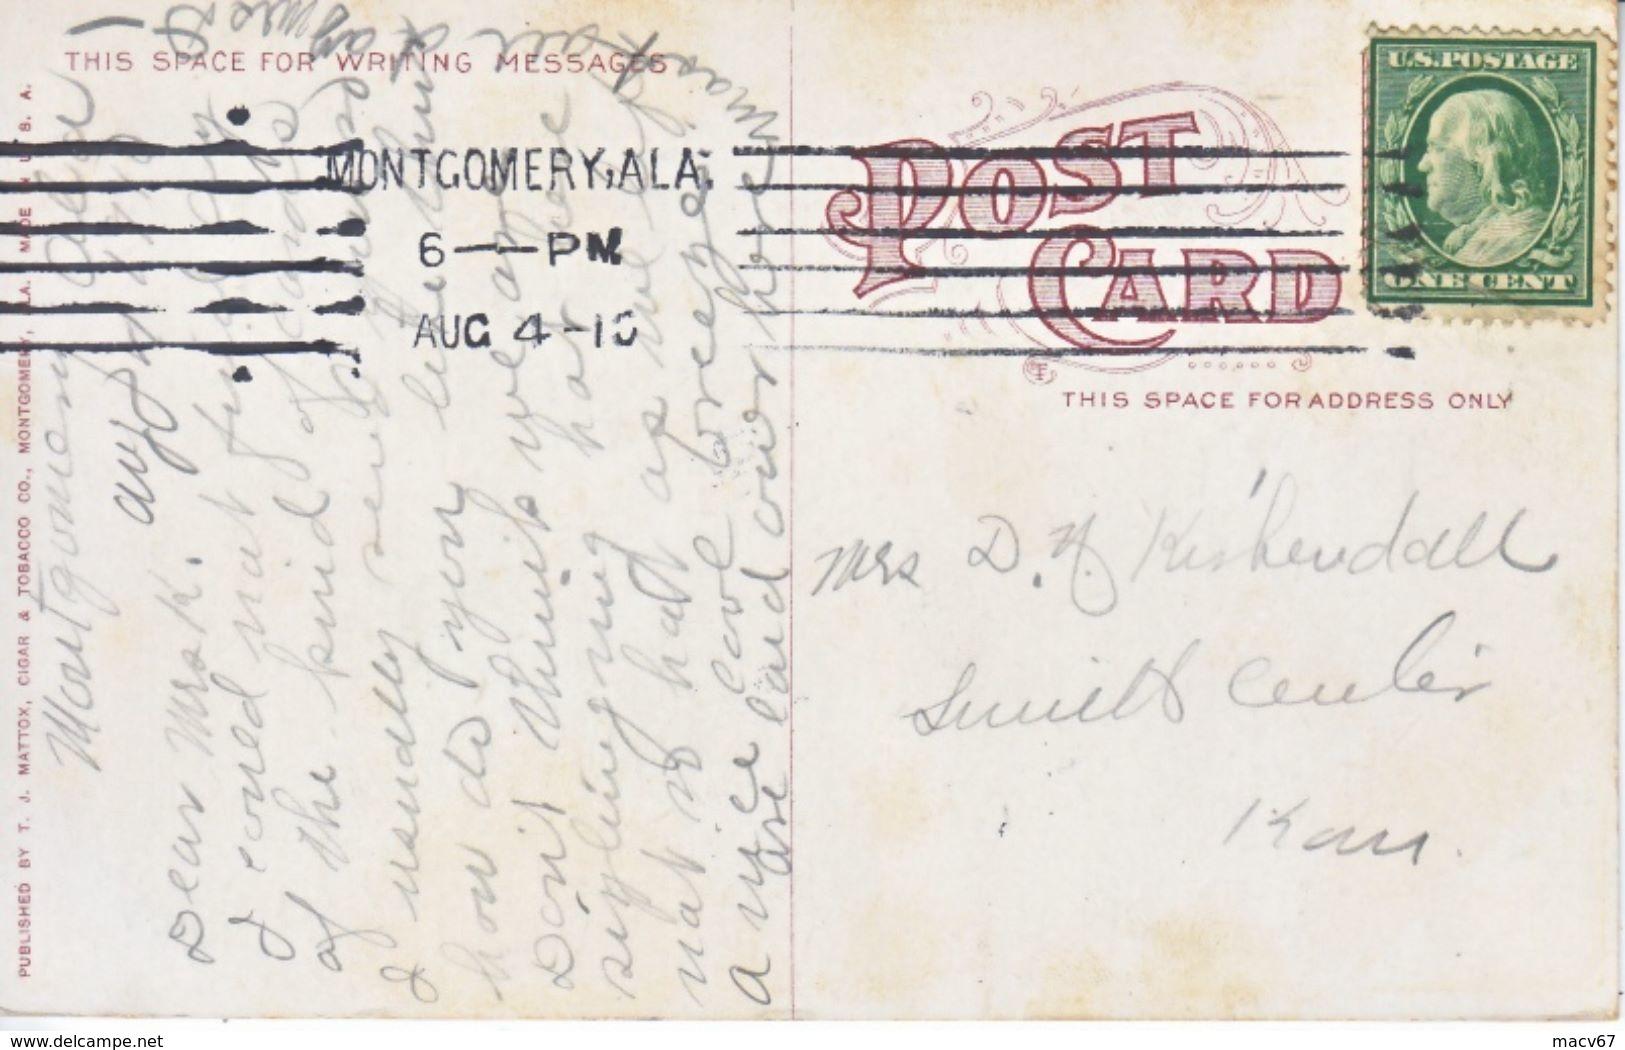 BLACK  AMERICANA  MONTGOMERY, ALA.  1910  PICKANINNIES  WATERMELONS - Black Americana